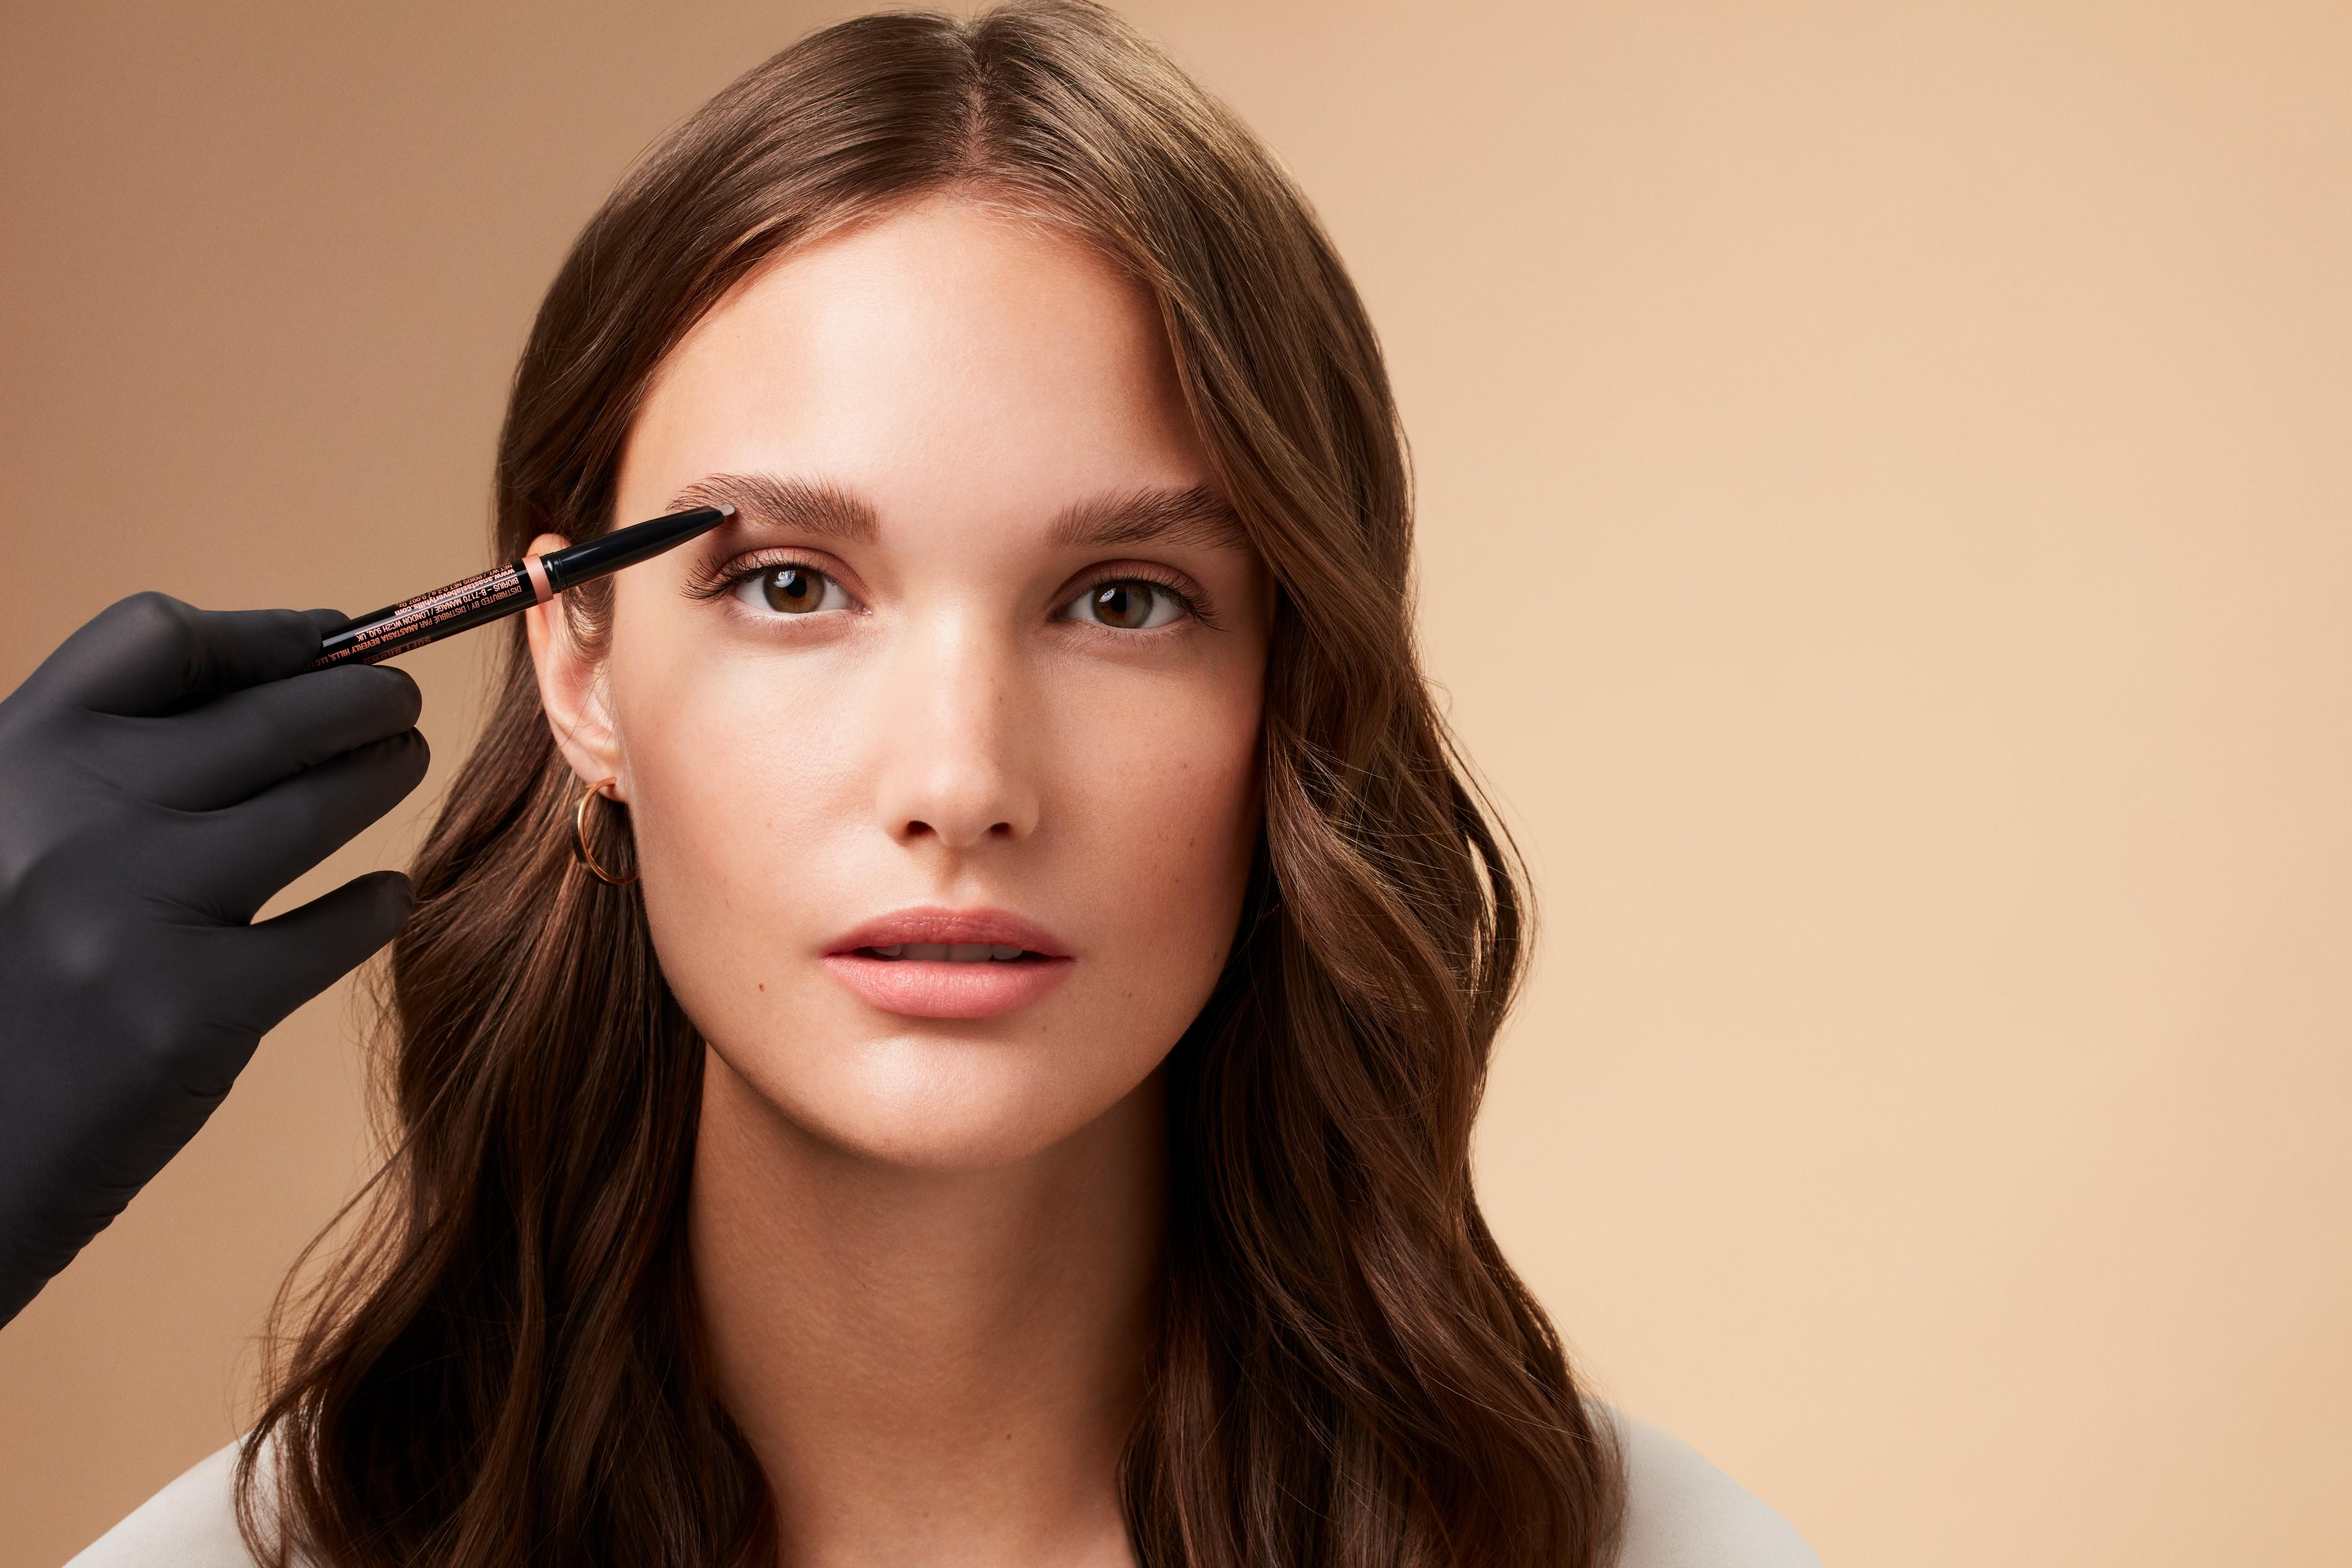 Makeup-application-soap-brows-V3-052023-Web-Rendition